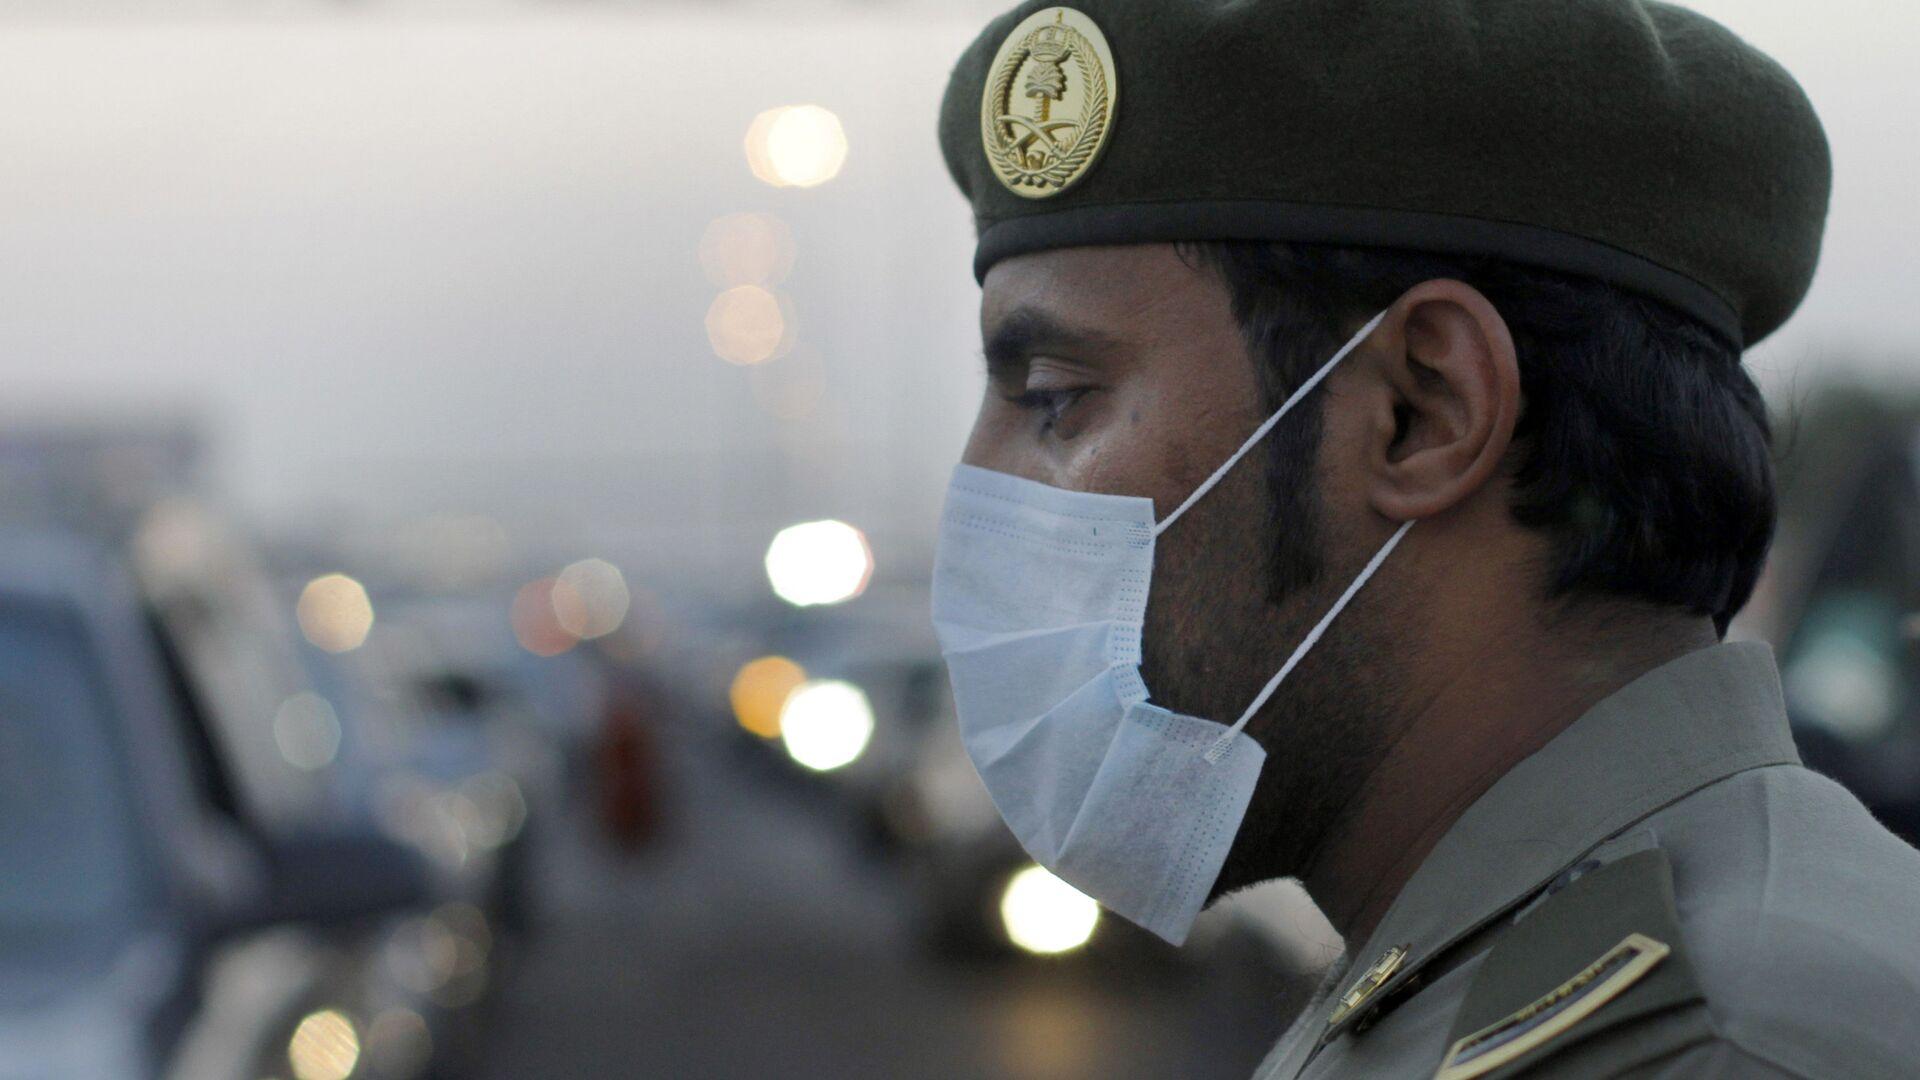 Un poliziotto saudita con mascherina - Sputnik Italia, 1920, 14.06.2021